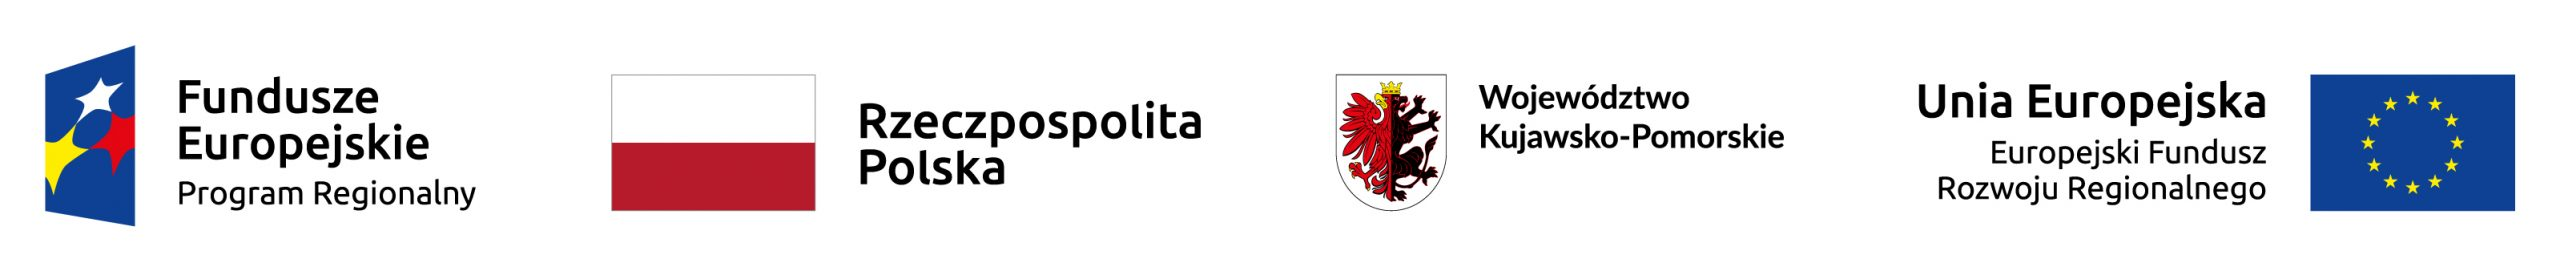 unijne logotypy